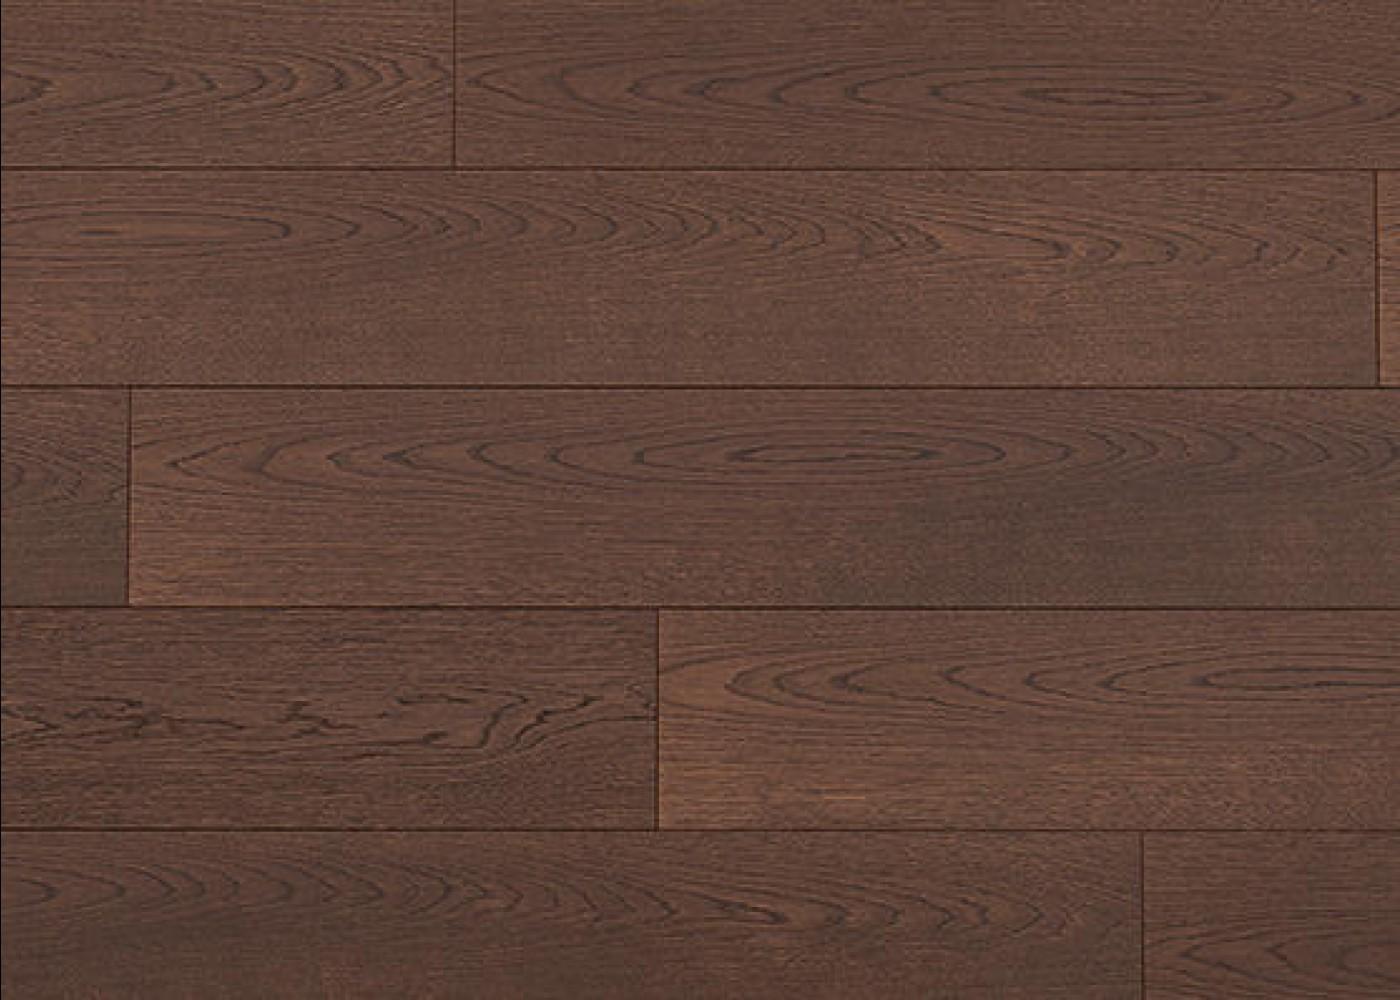 Sol plaqué bois Chêne QUIBERON brossé vernis extra-mat - Master - Select 10x166x1506